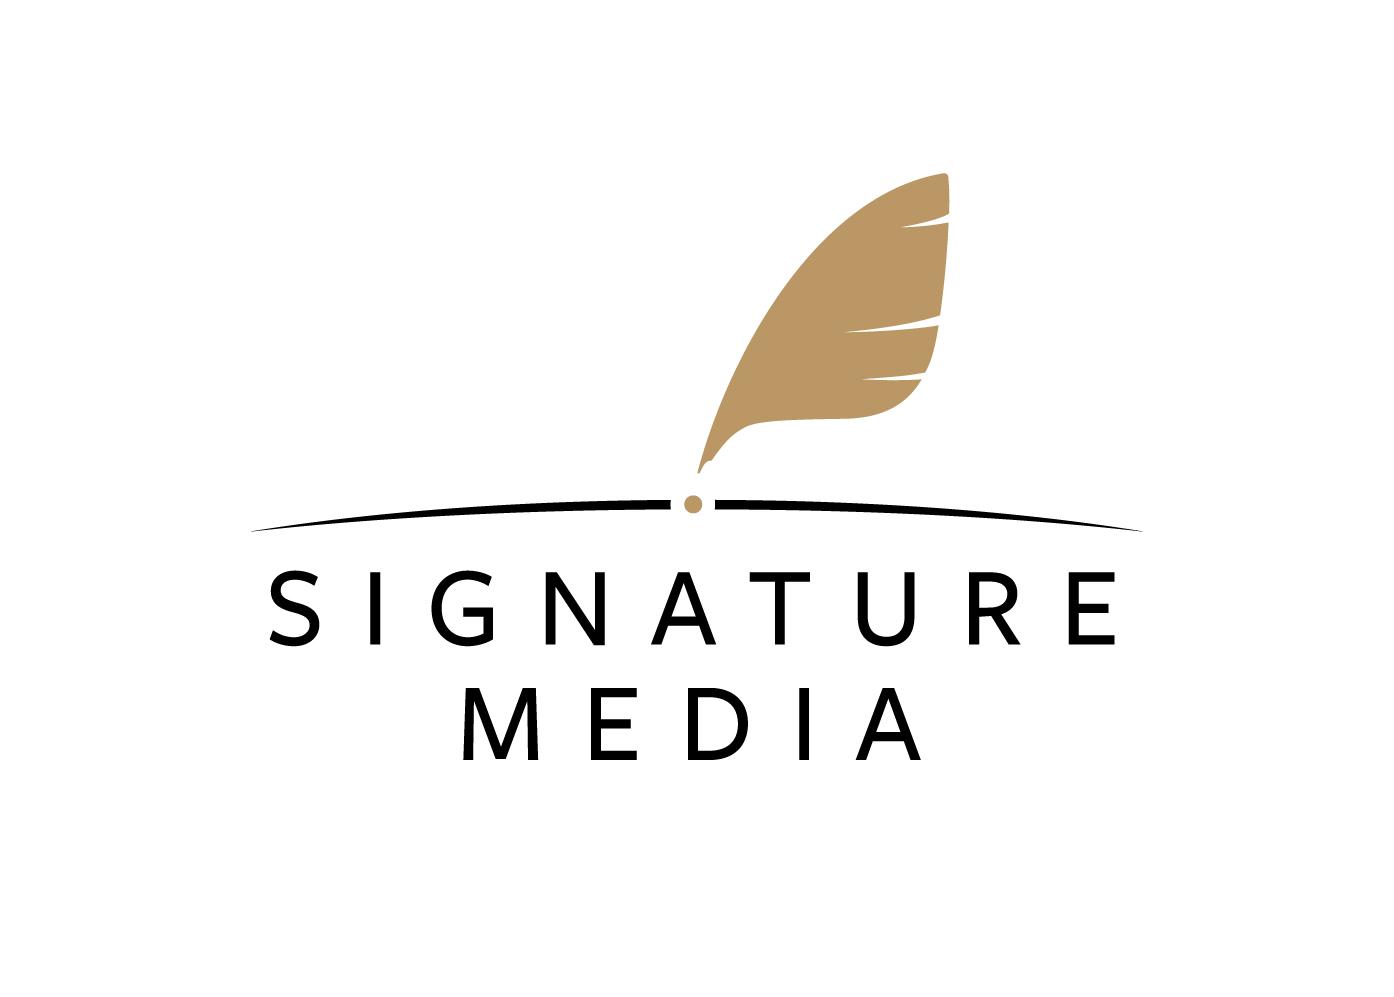 Cathy Wagstaff, Signature Media, NSW, Australia